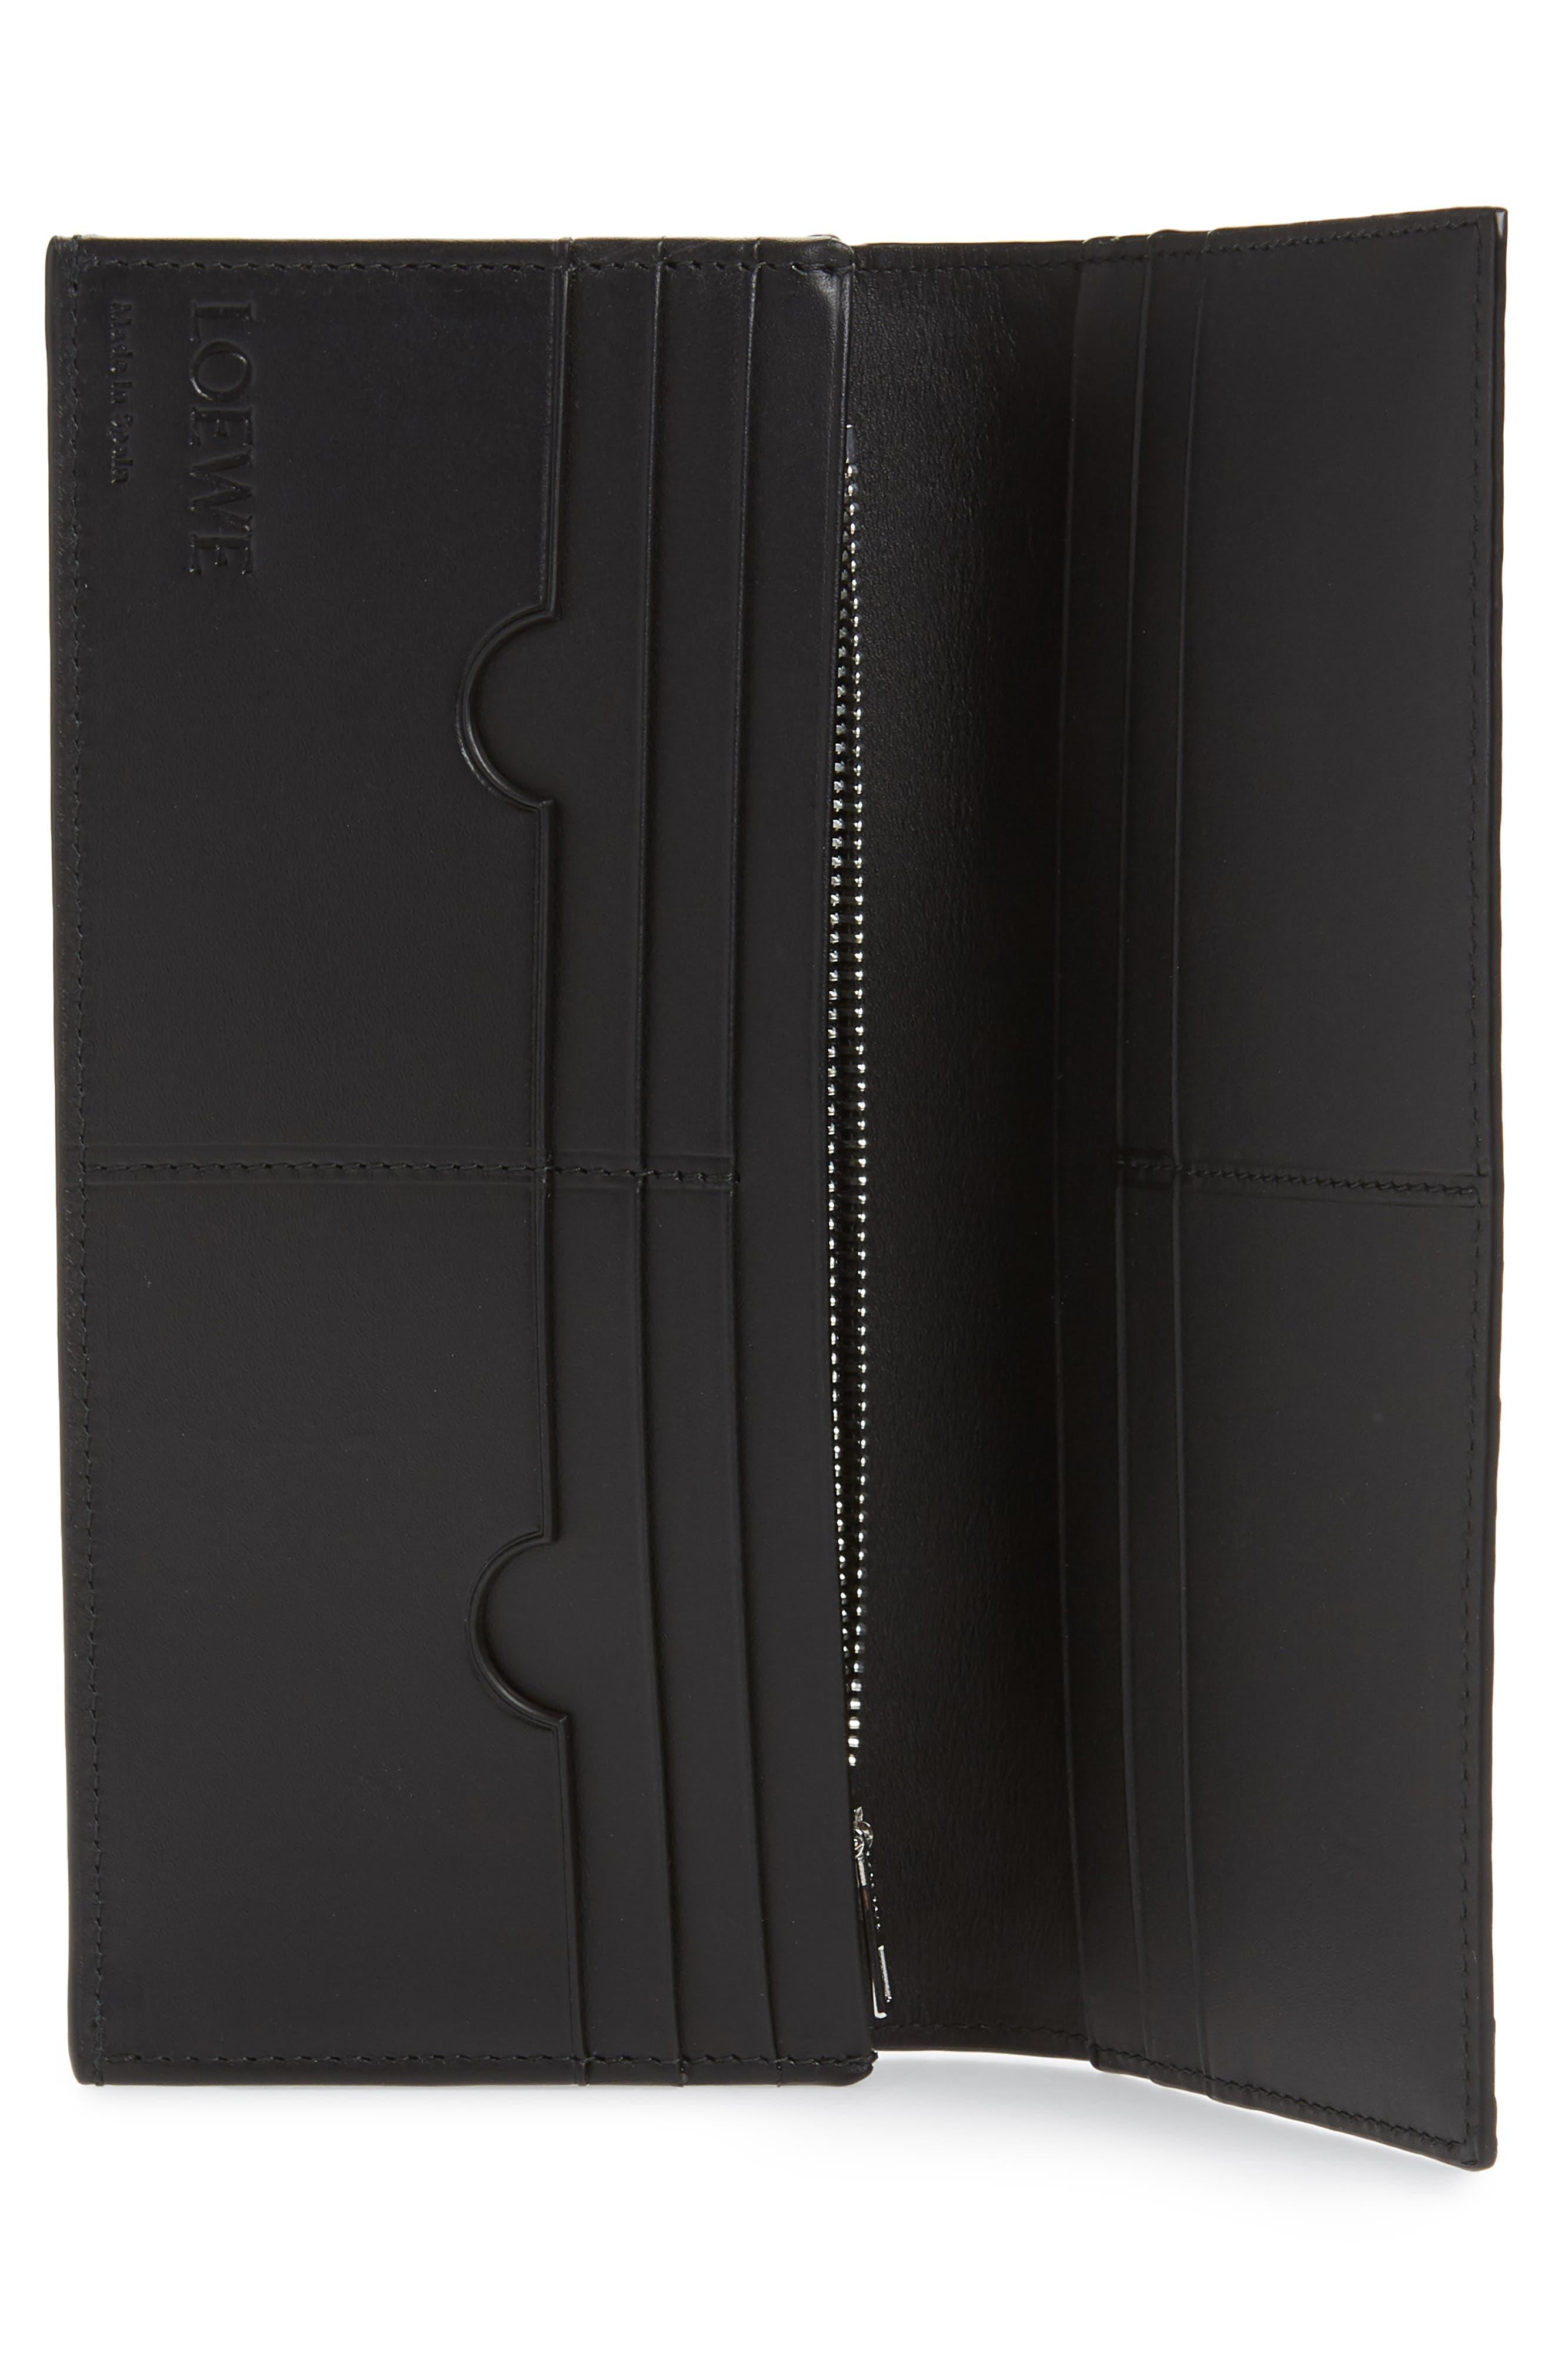 LOEWE, Bifold Leather Wallet, Alternate thumbnail 2, color, BLACK